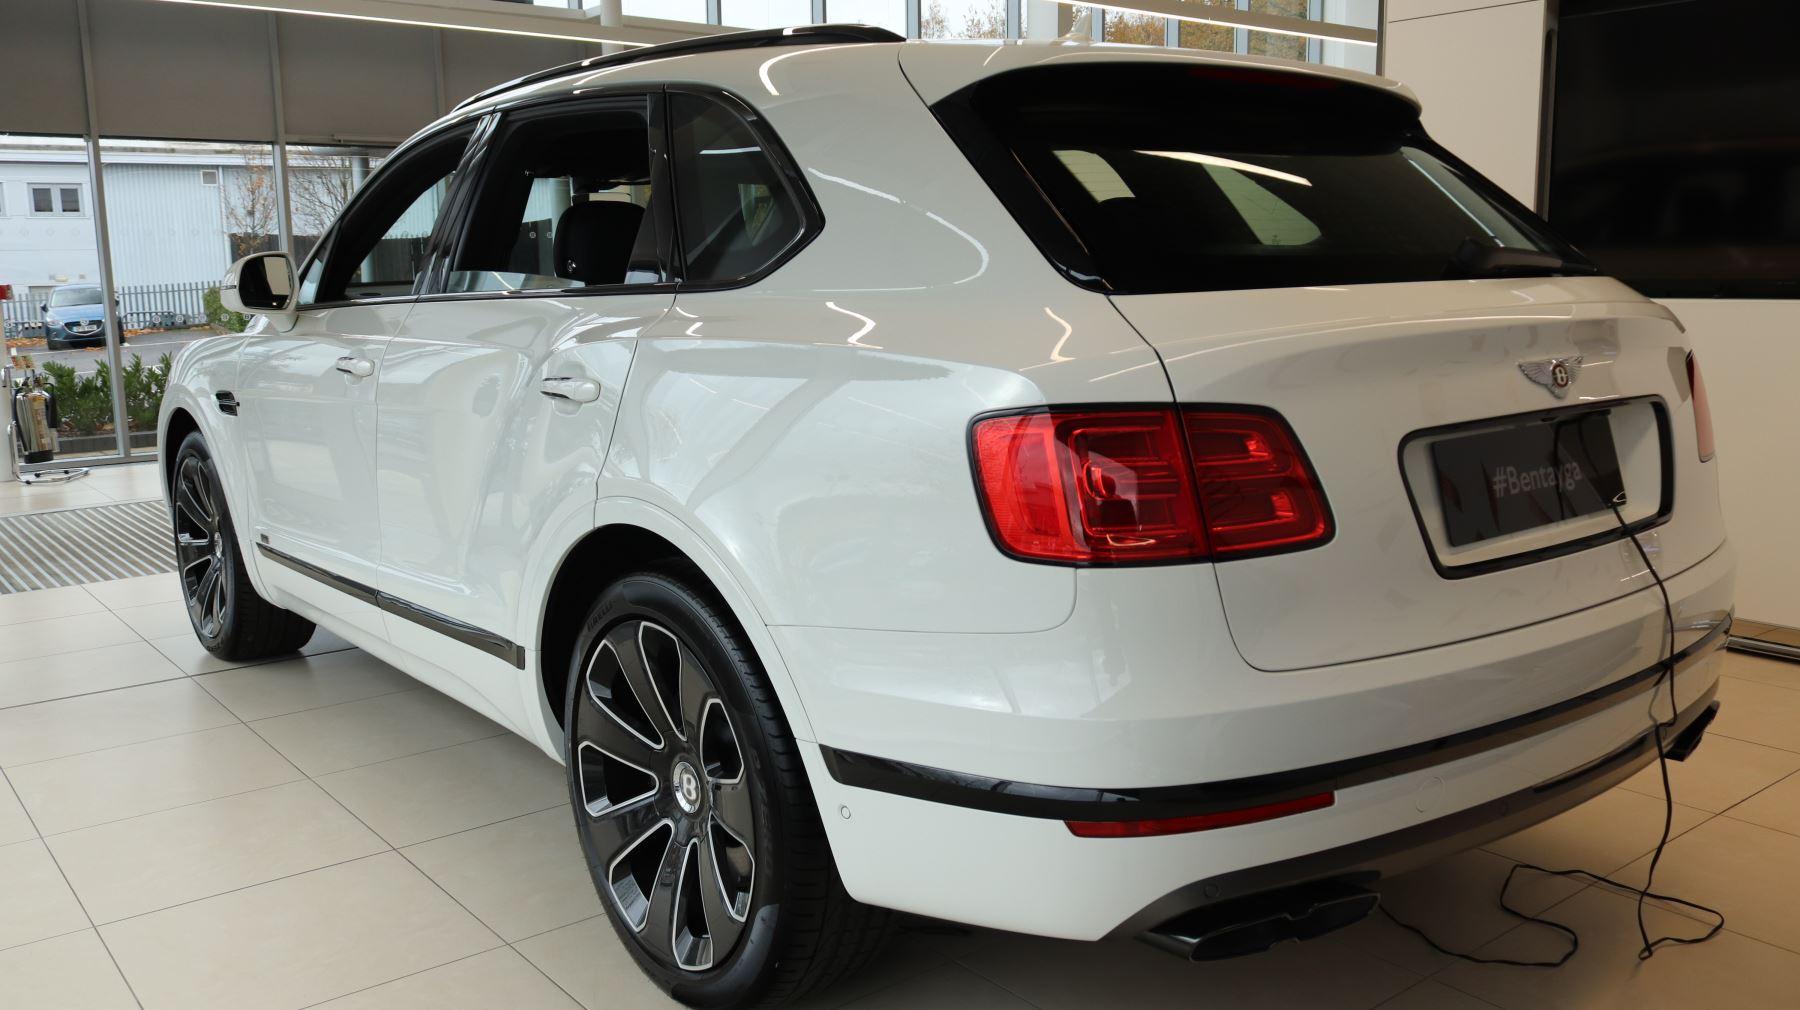 Bentley Bentayga 4.0 V8 5dr image 4